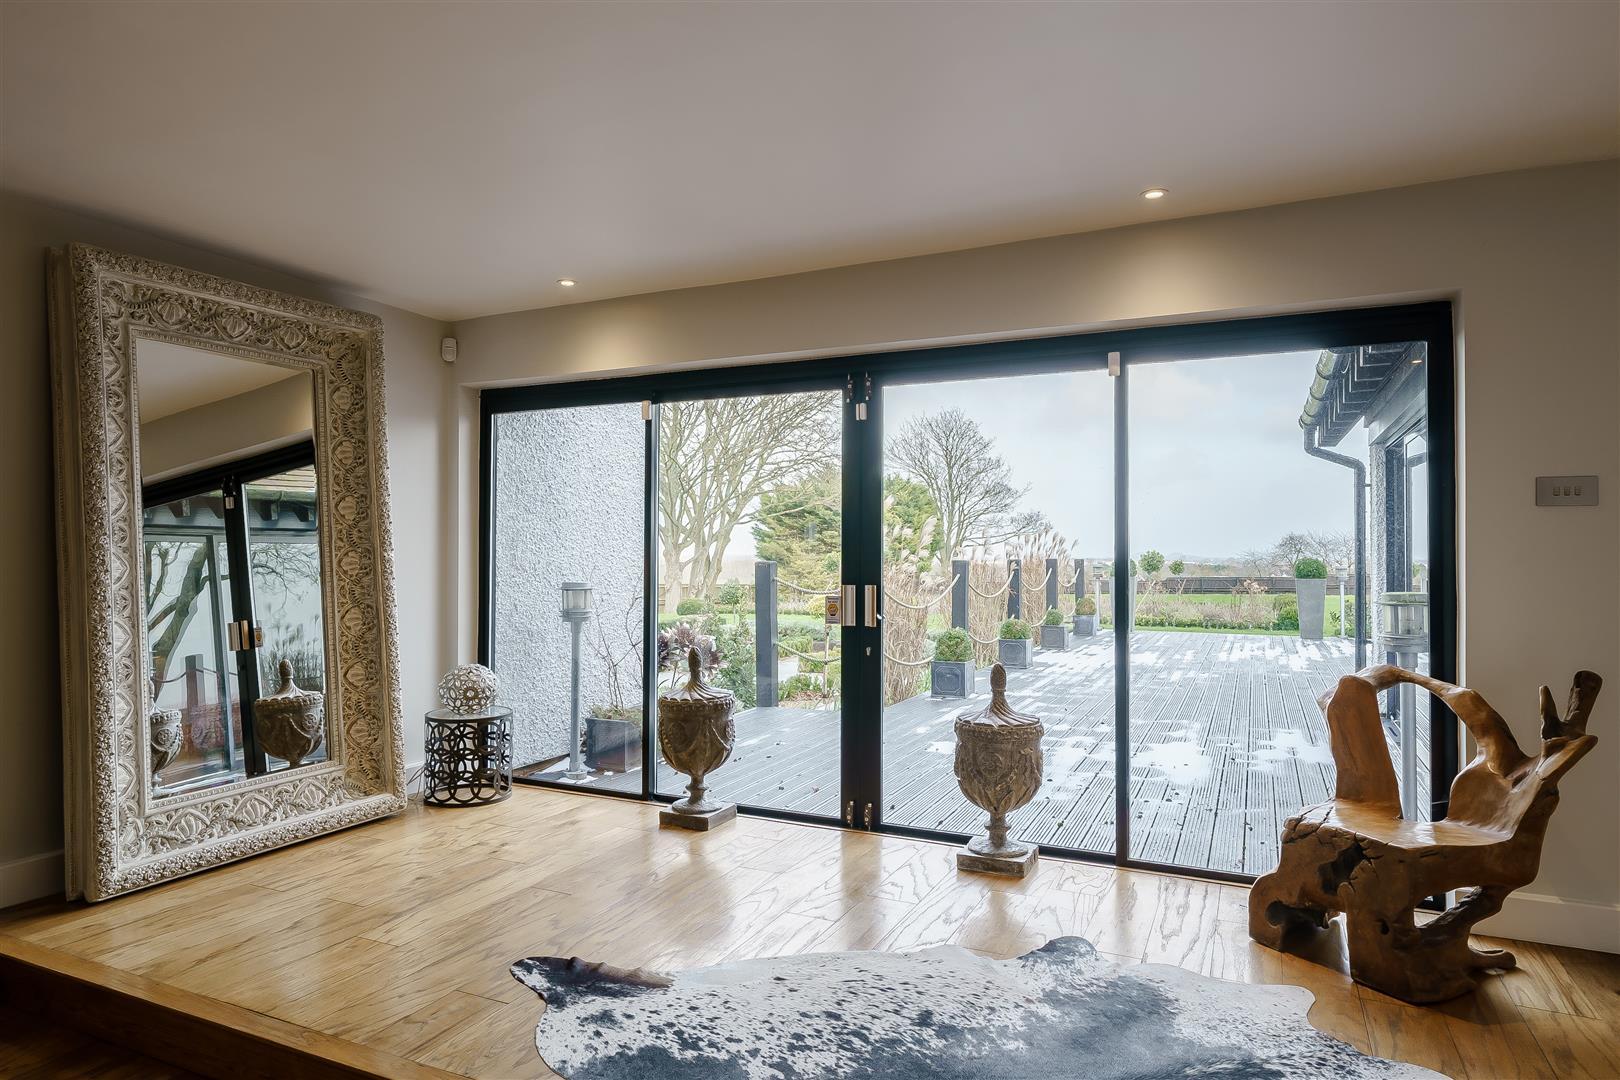 Rowstock Manor - Gallery Image 02 - Hallway